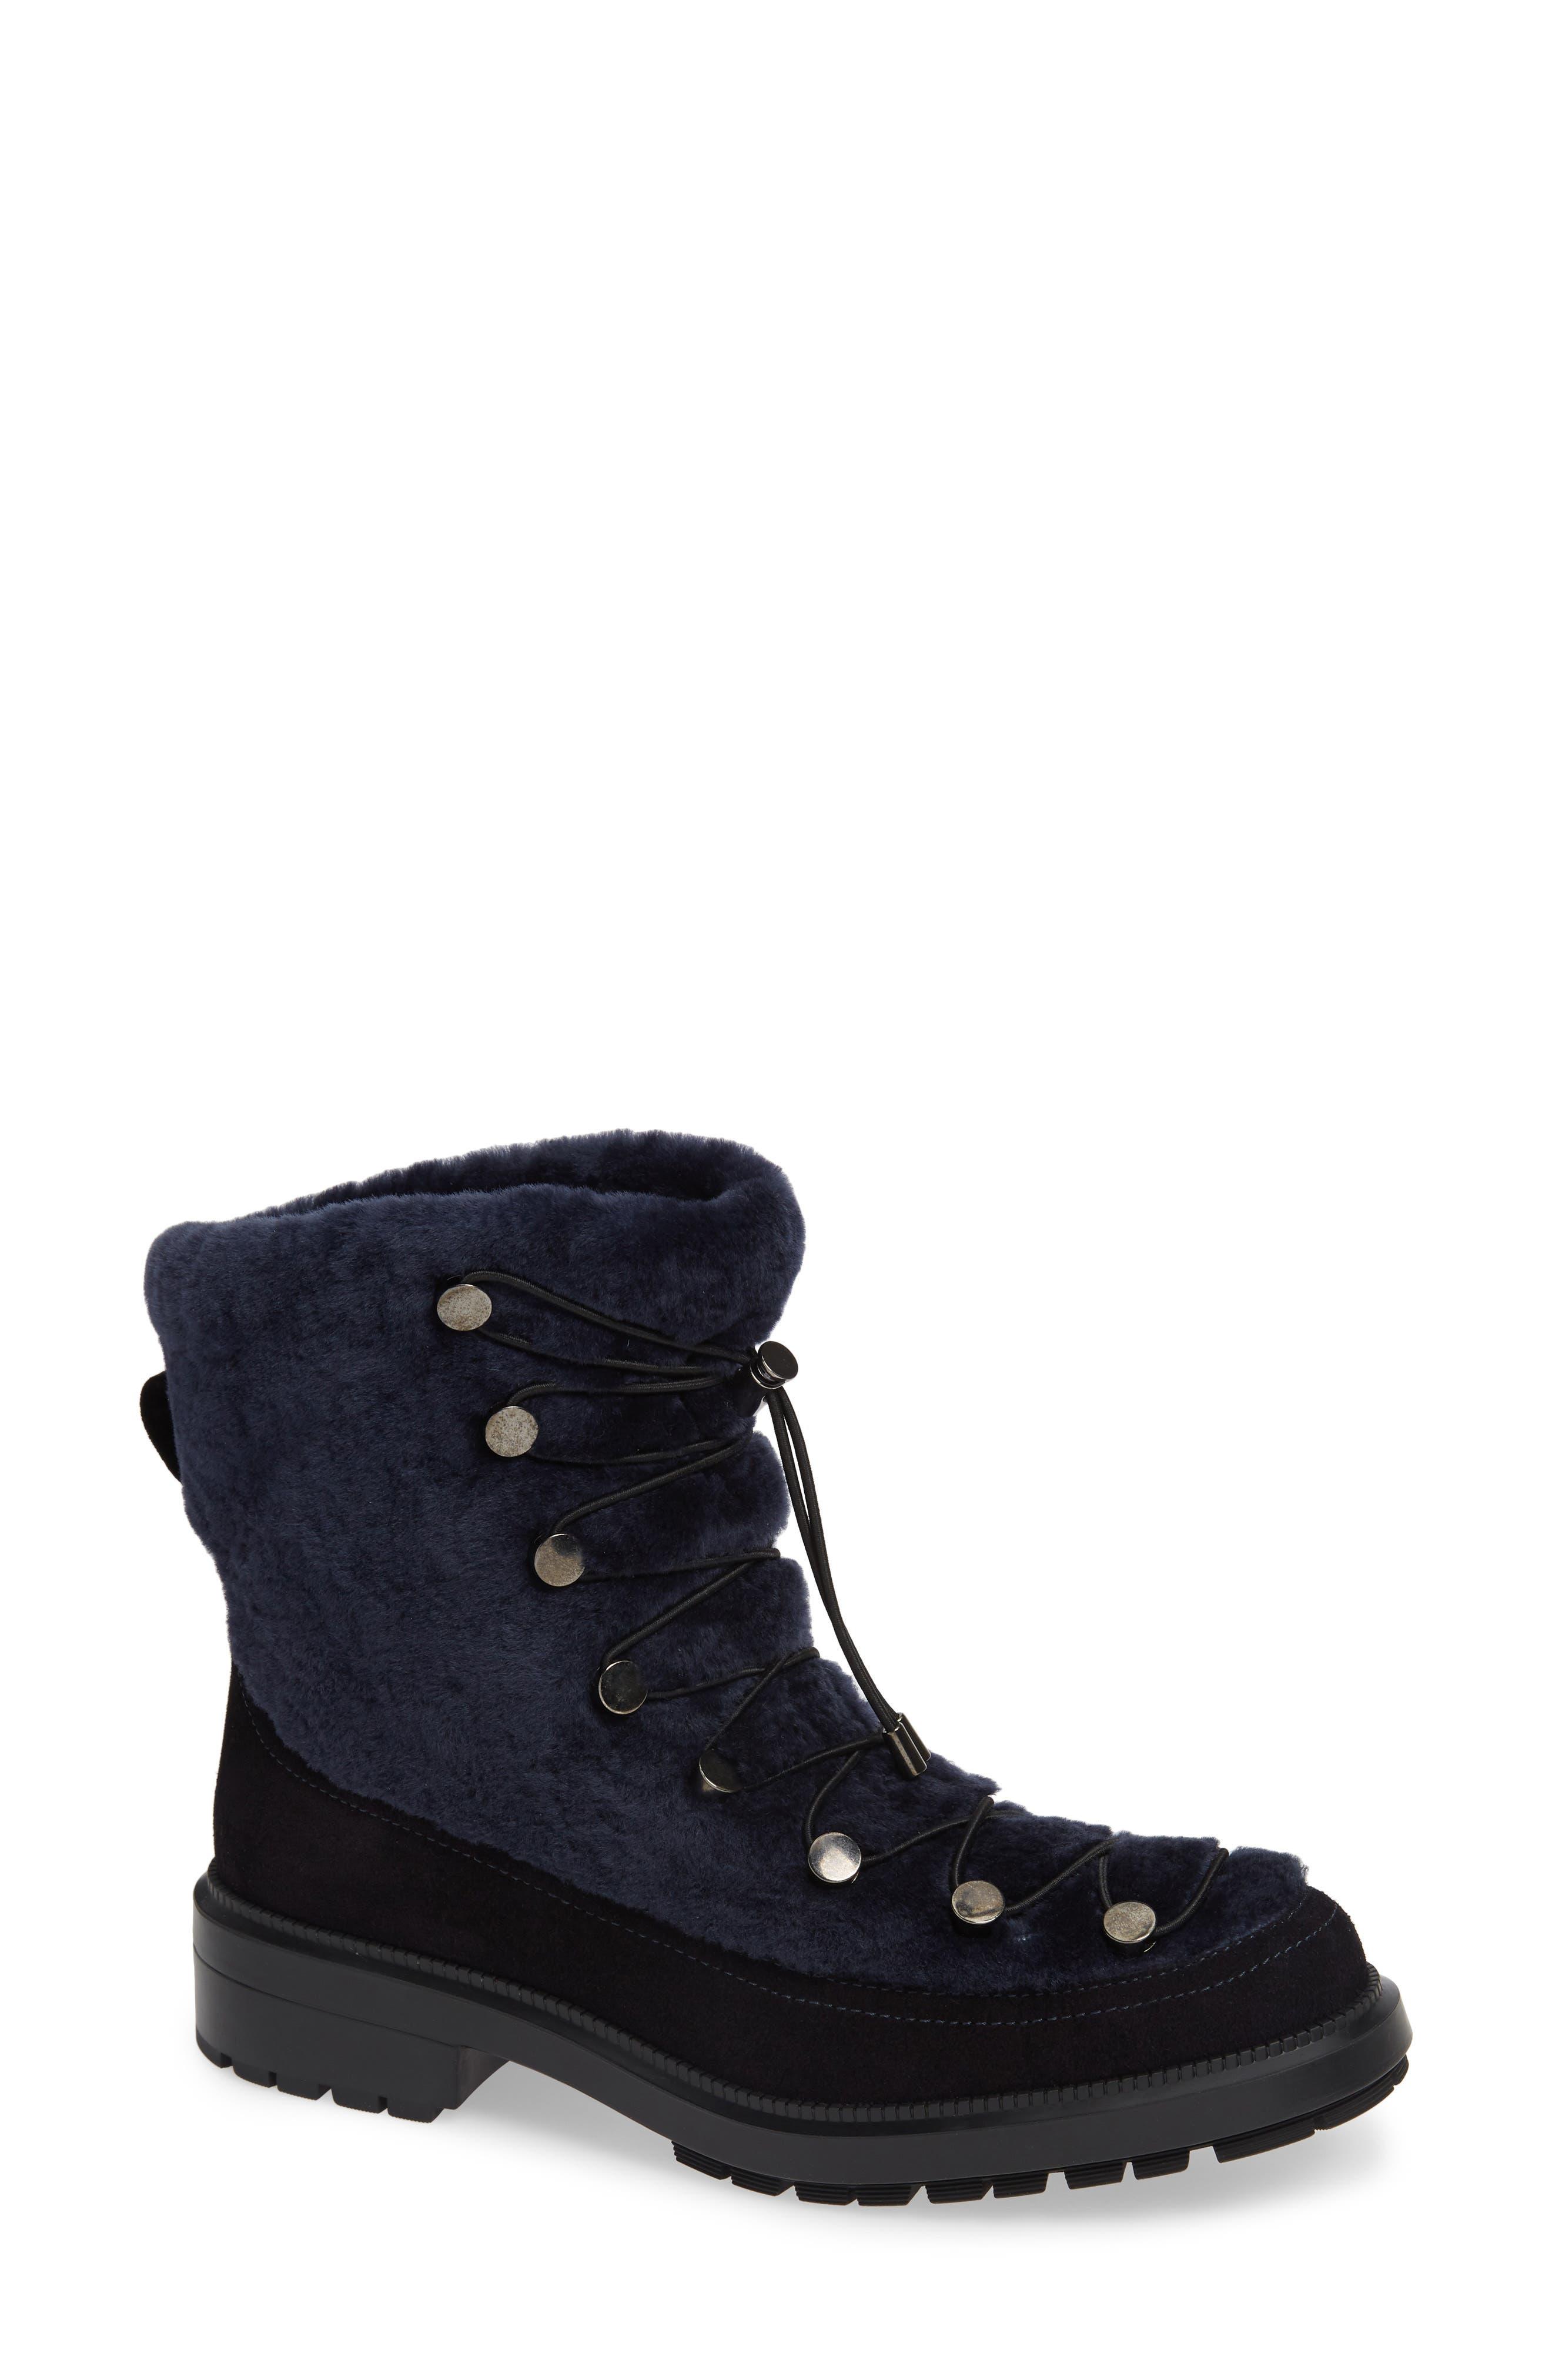 Aquatalia Lorena Genuine Shearling Boot, Blue